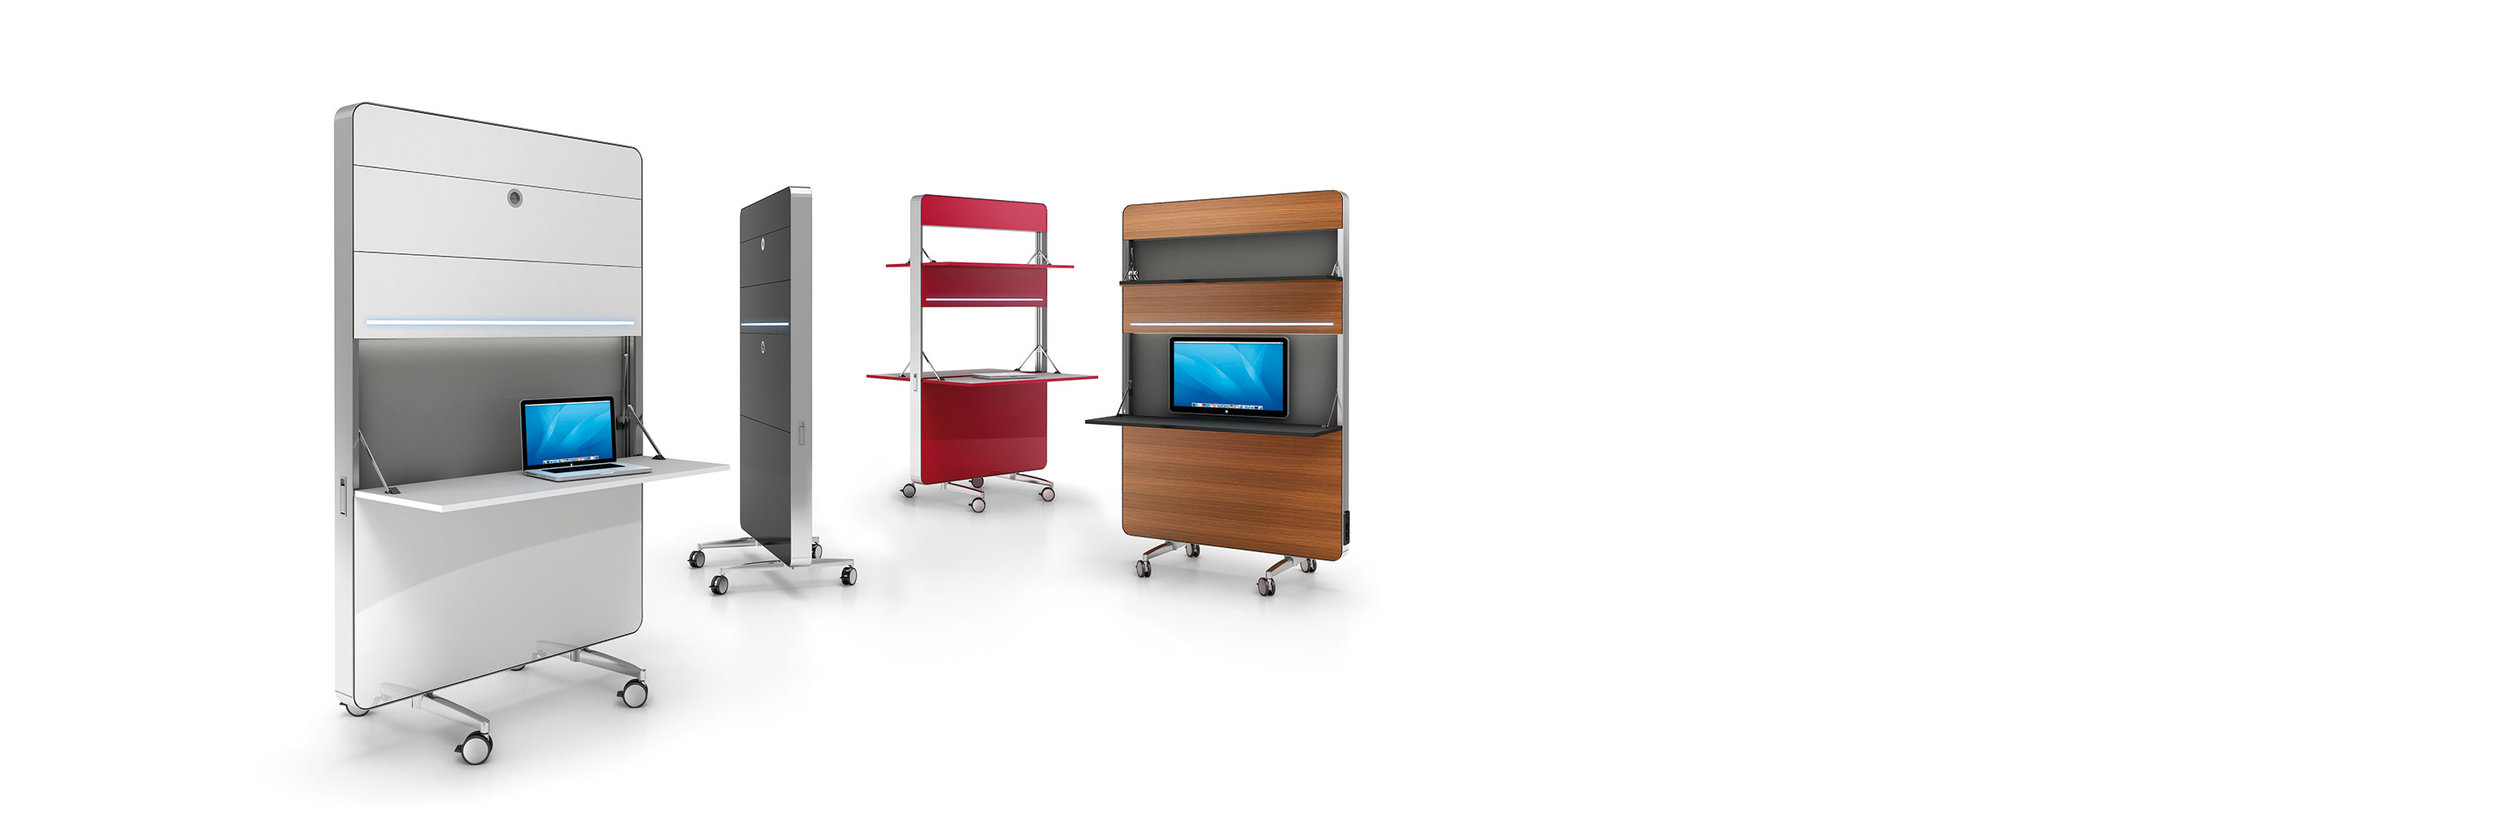 Nomado - Mobile stackable workstations